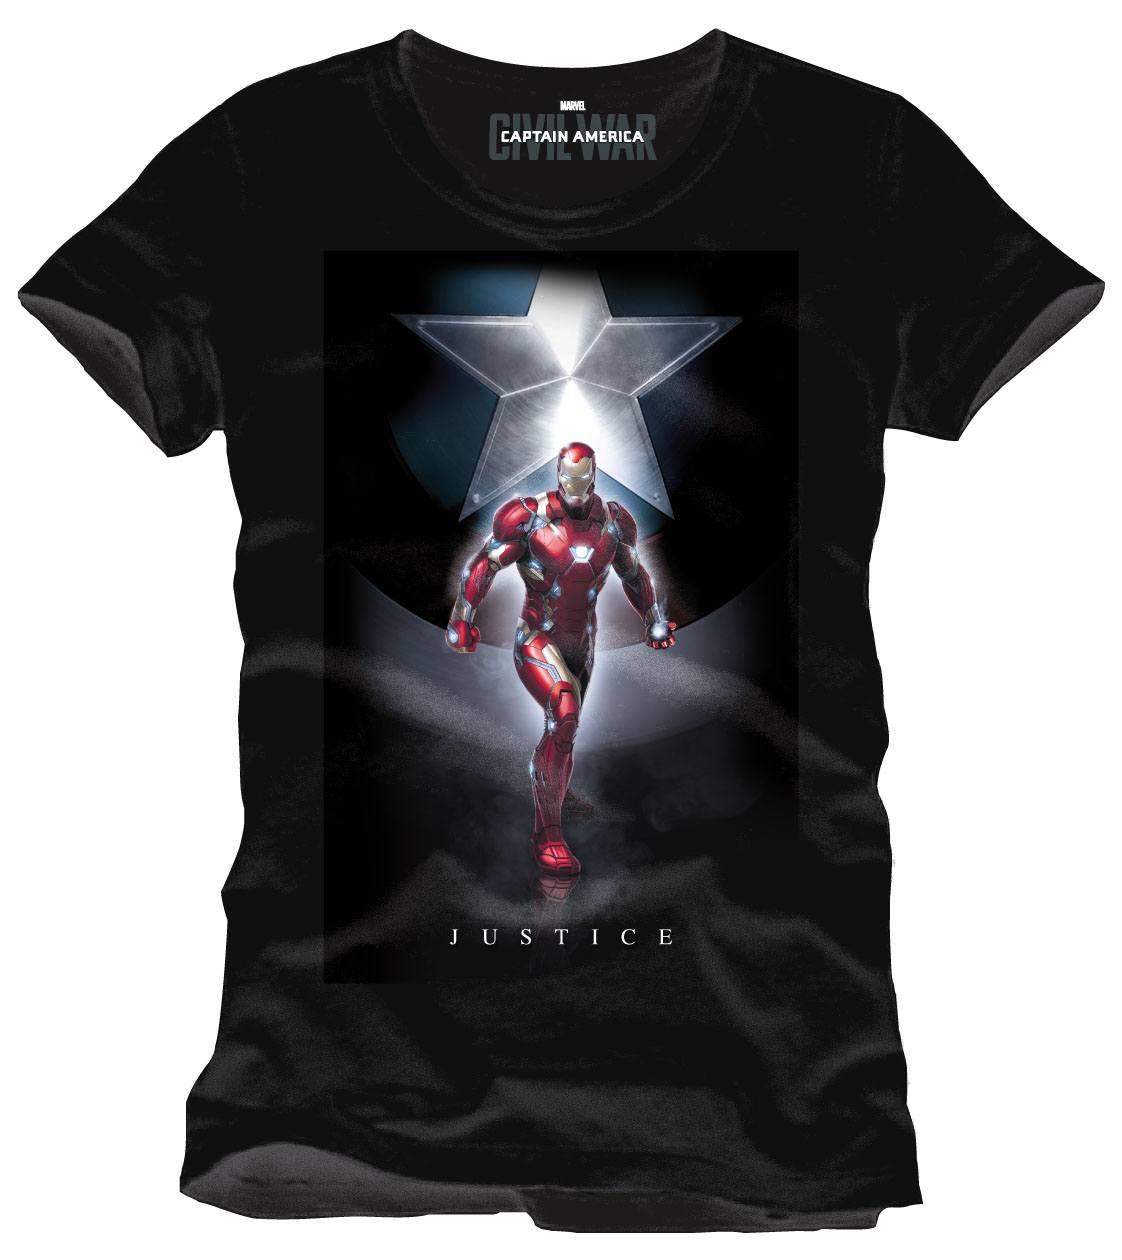 Captain America Civil War T-Shirt Justice Size M